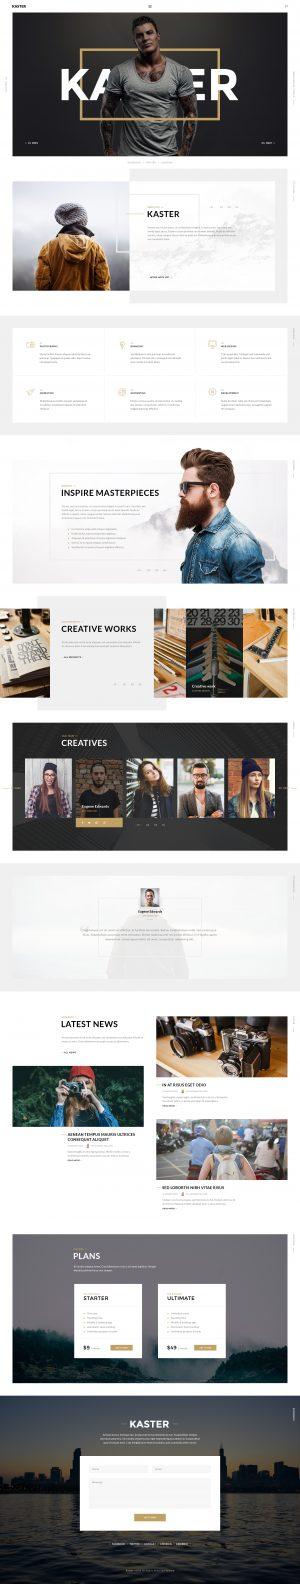 Kaster — Multipurpose Agency/Personal Portfolio & Modern Blog